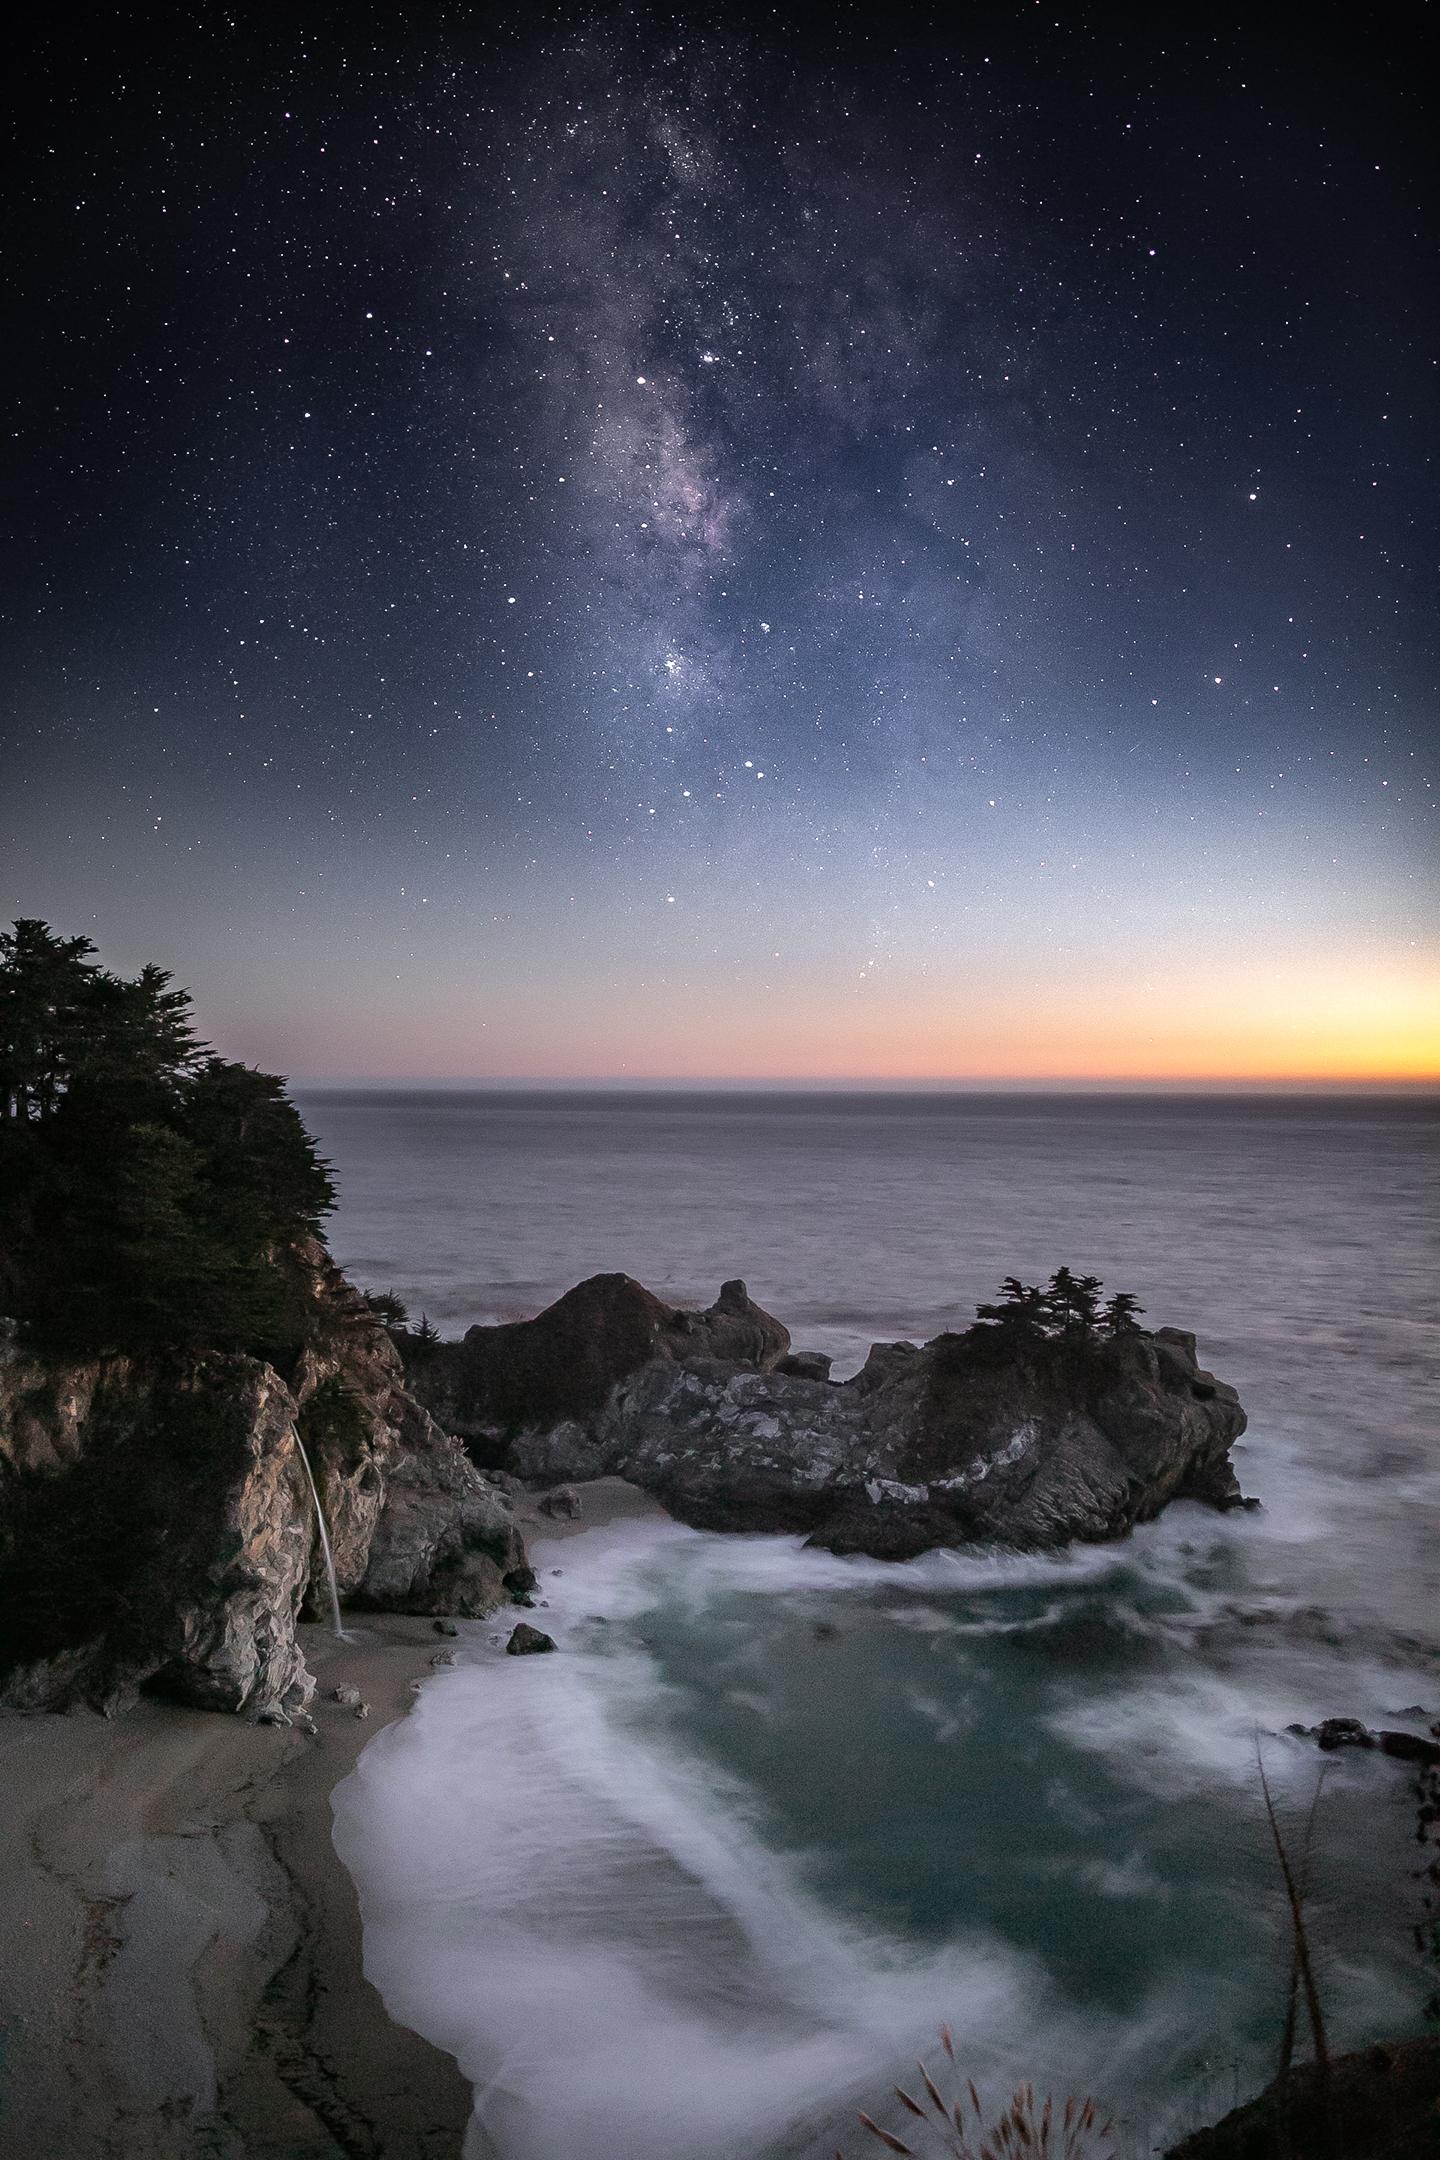 McWay Falls - Big Sur, California // Photographer: Jason Wilson // Canon 5D MK III + Rokinon 24mm // ISO 5,000, f/1.4, 8